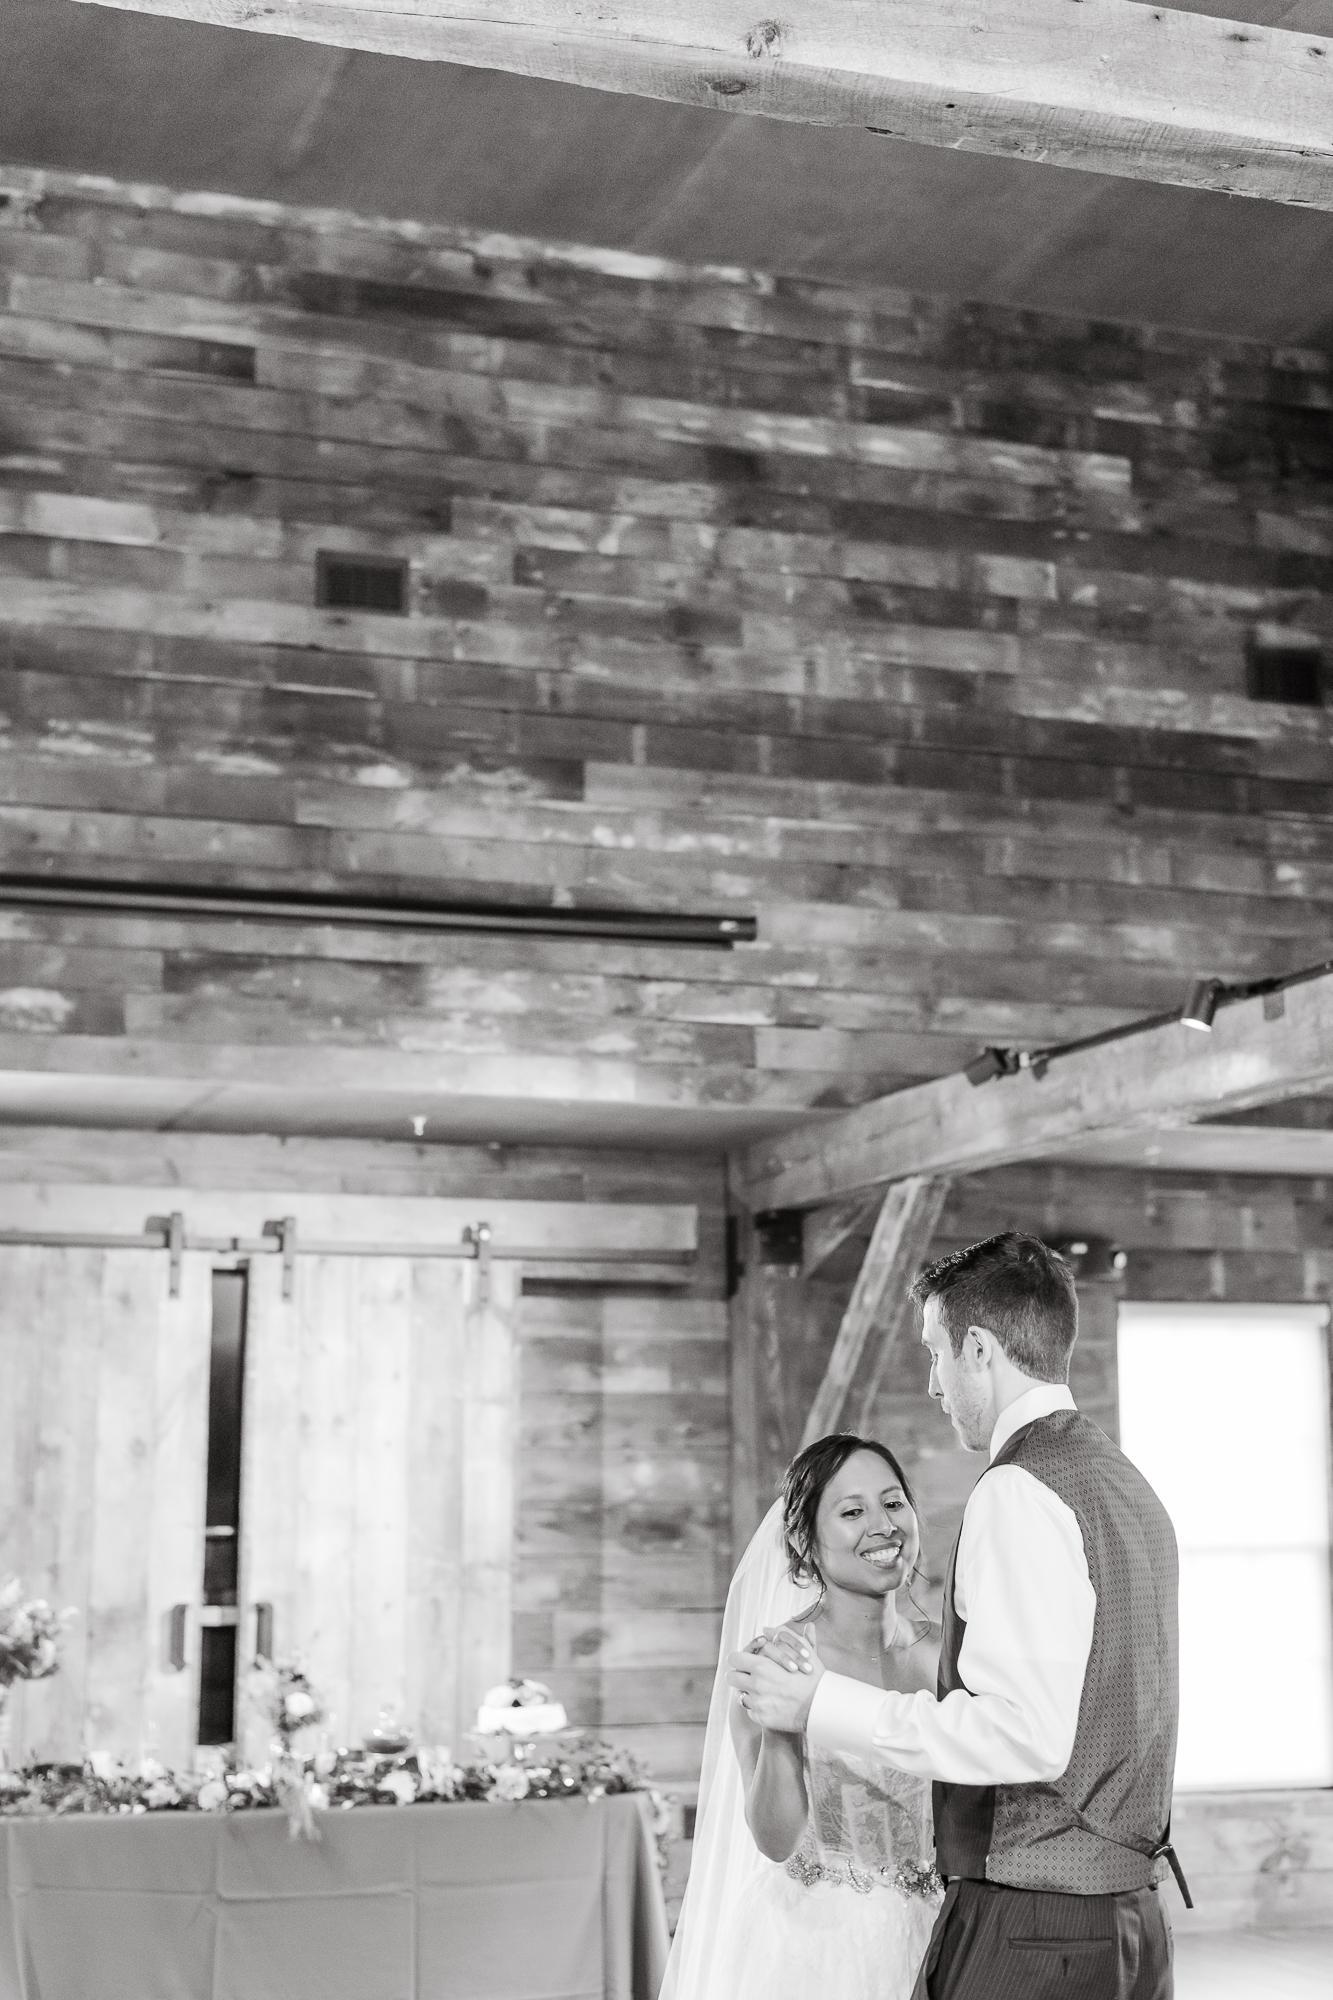 Maria+Adam_Summer Barn Wedding_The Barn at The North Star Preserve_Oberlin_Ohio-192.jpg